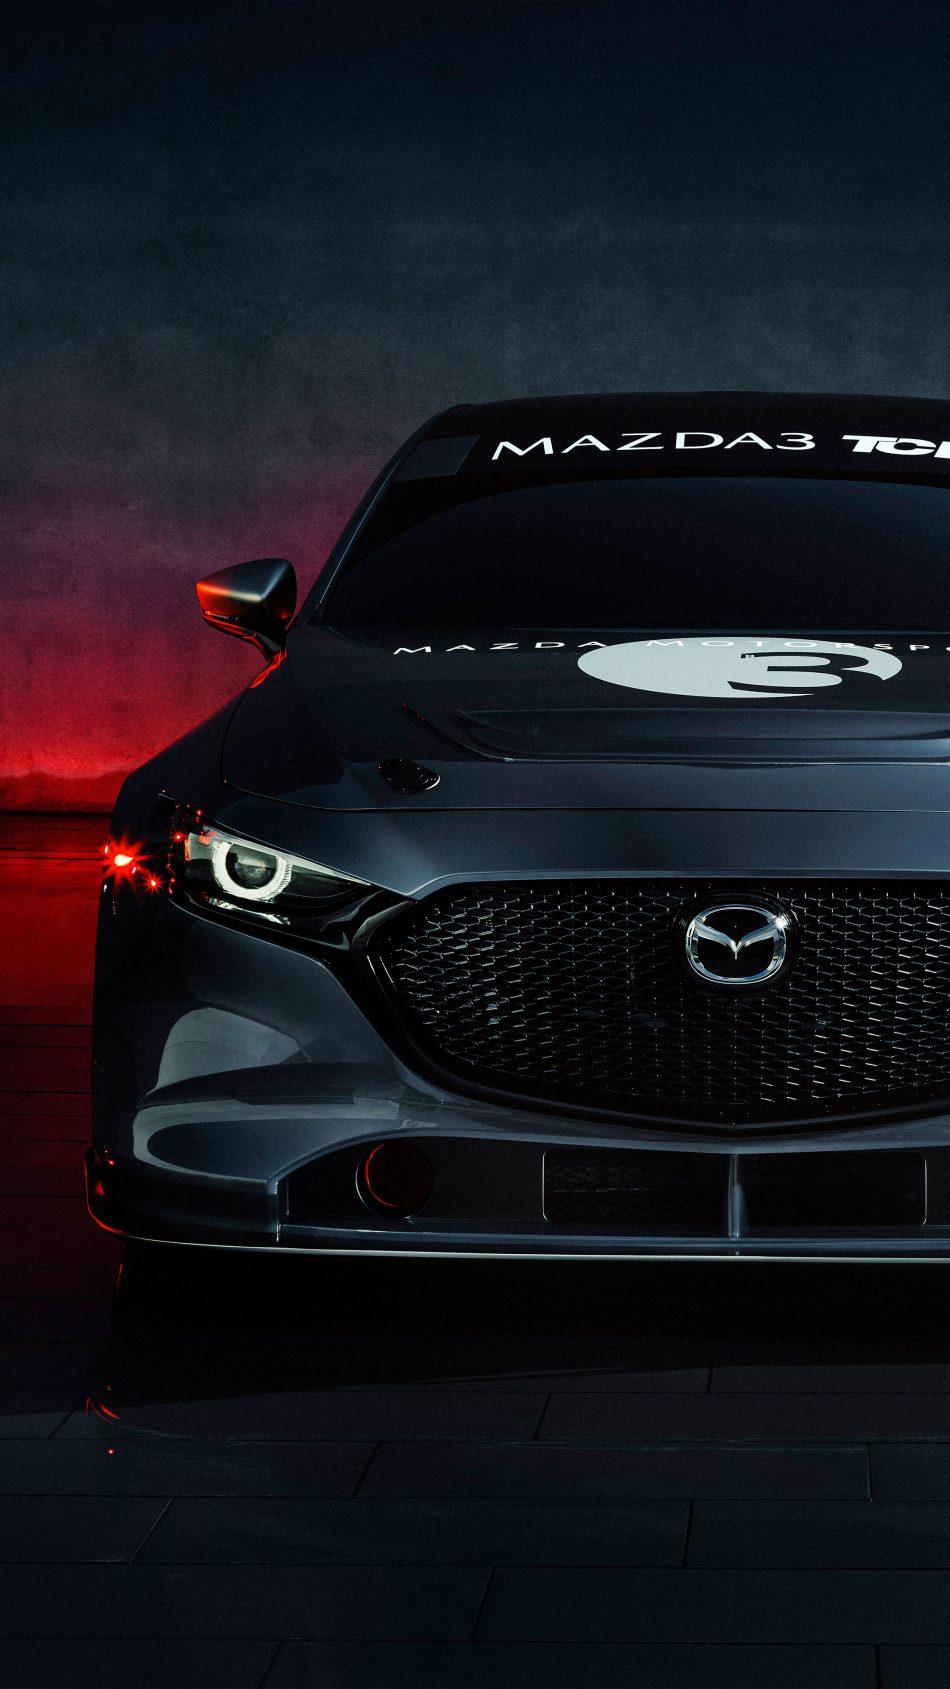 Mazda 3 TCR Race Car 2020 4K Ultra HD Mobile Wallpaper